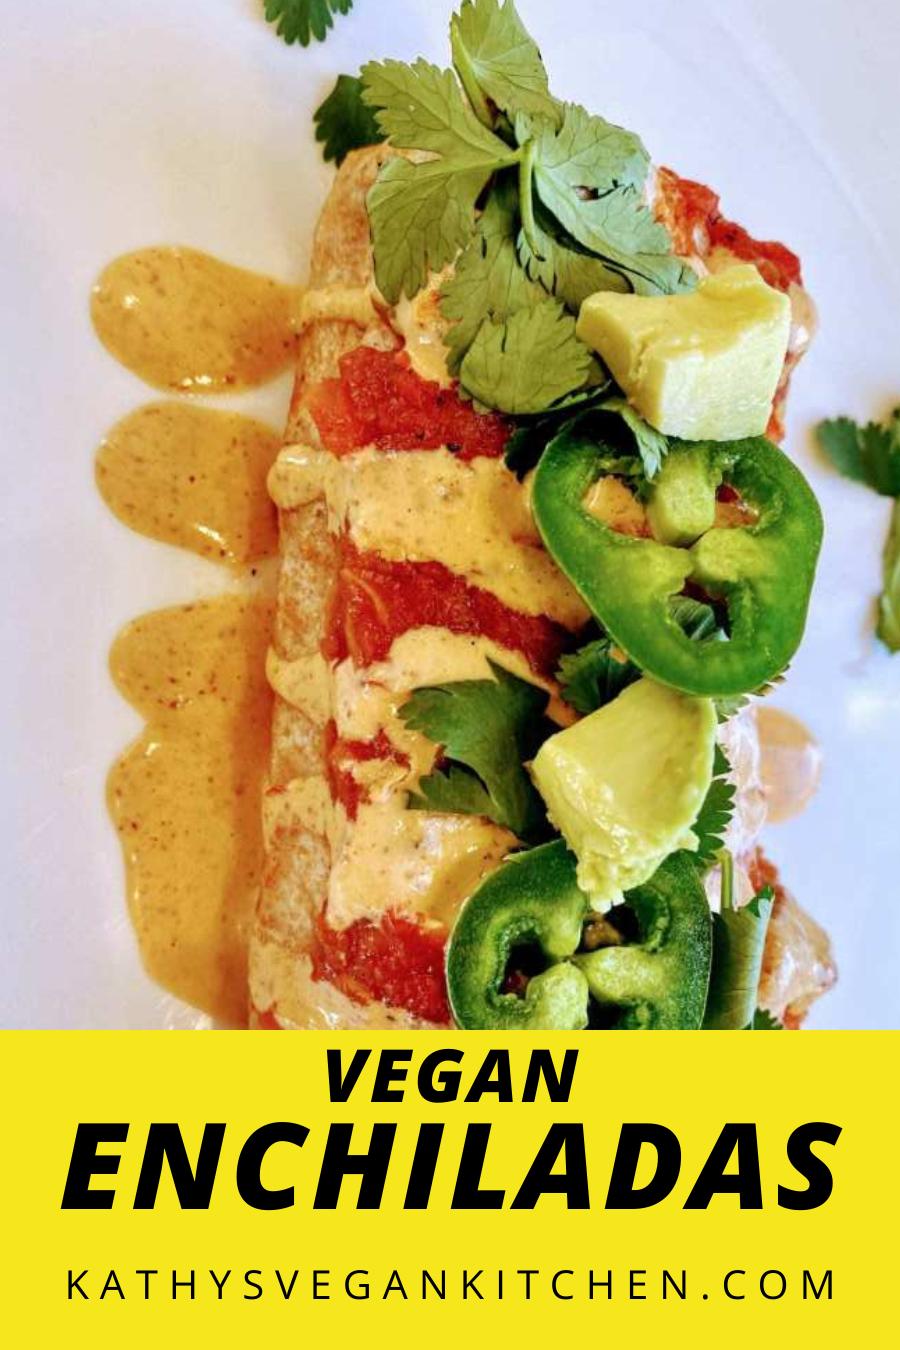 Vegan Enchiladas Vegan Enchiladas Recipe Kathy S Vegan Kitchen Recipe In 2020 Vegan Comfort Food Vegan Dinner Recipes Easy Vegan Enchiladas